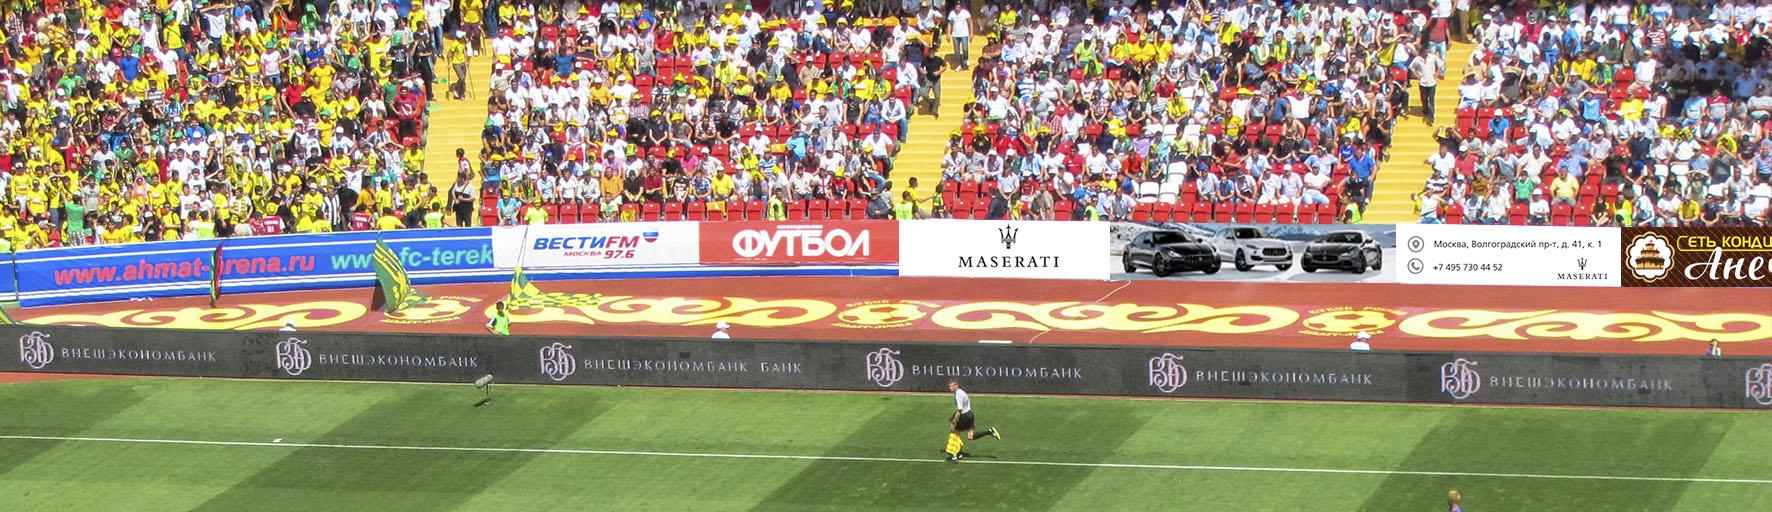 Размещение рекламы на Ахмат - Арена / стадион размещение